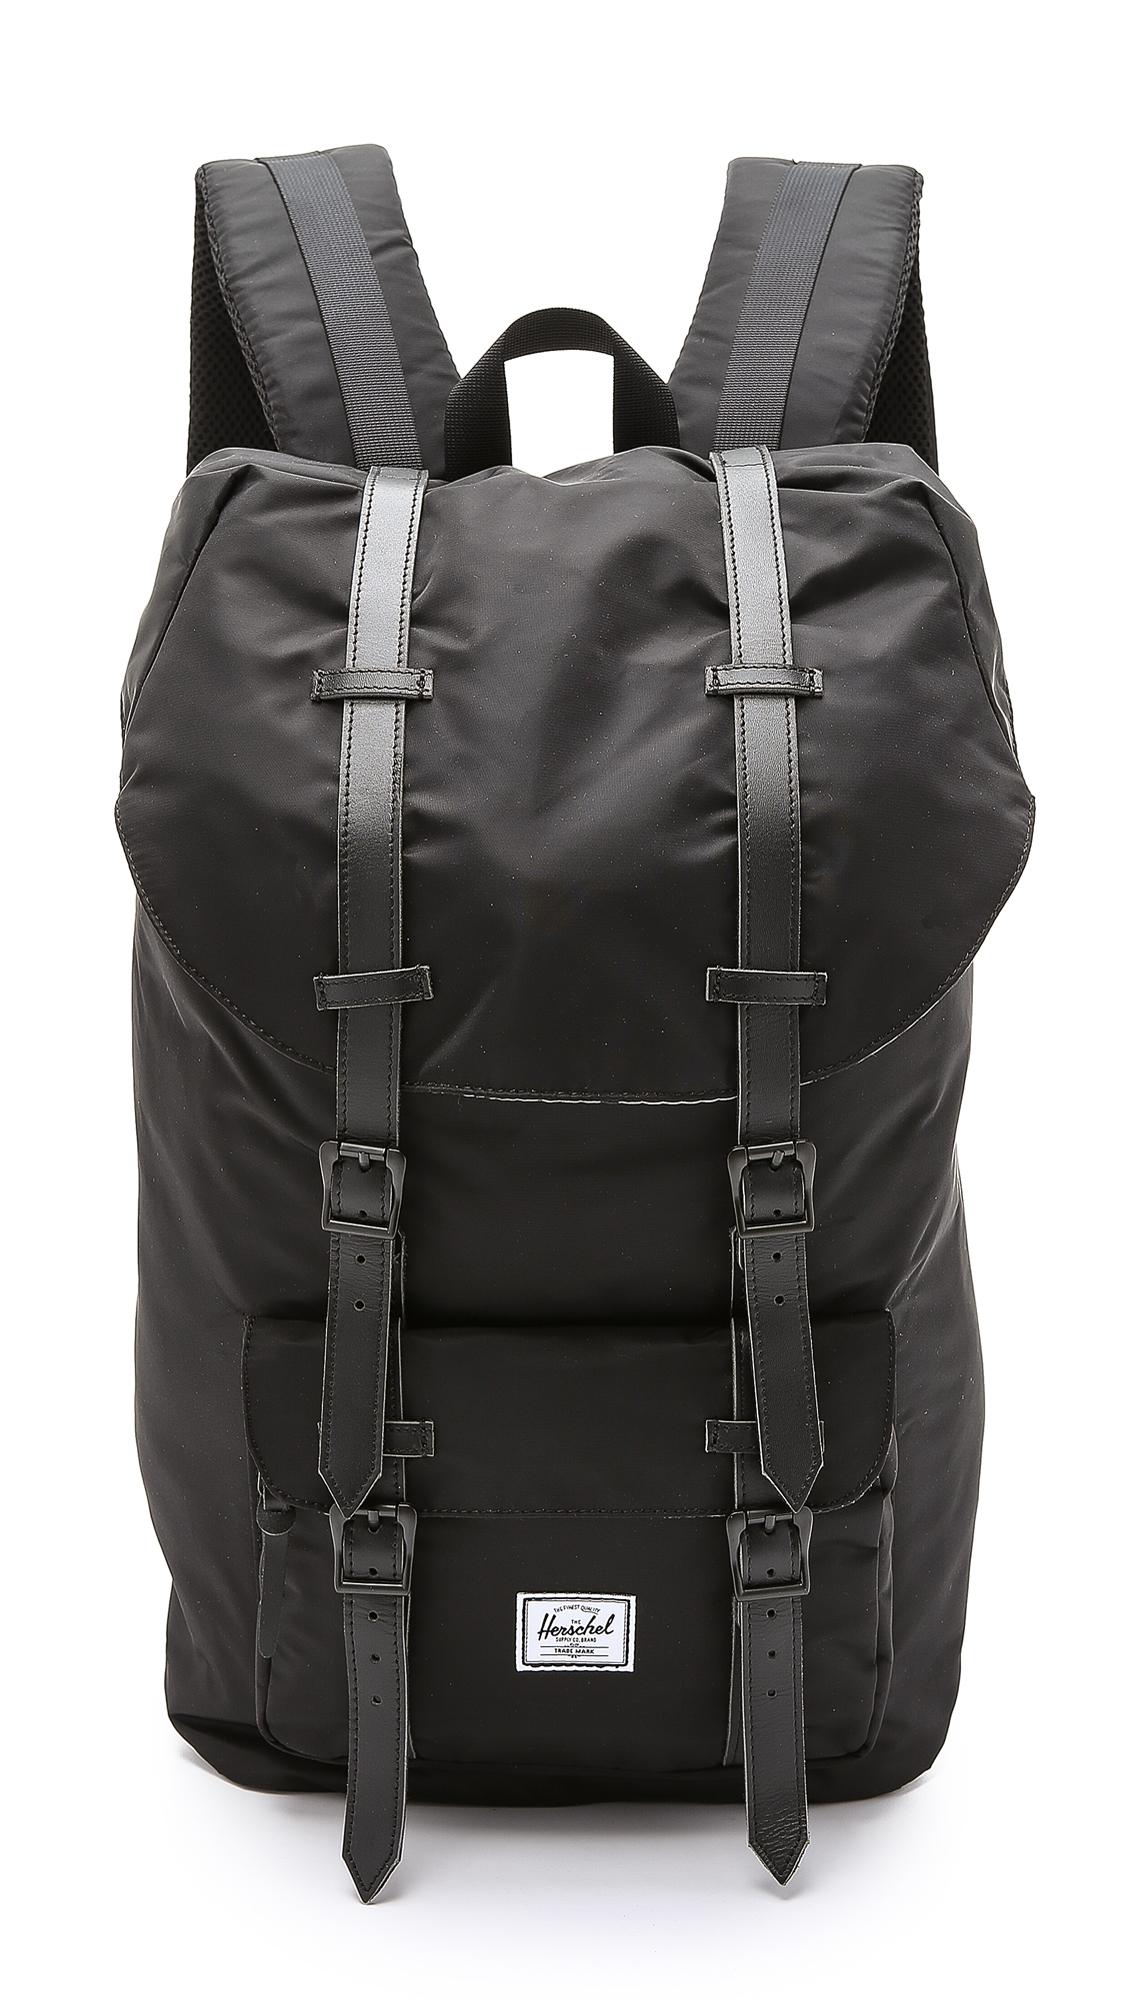 Lyst - Herschel Supply Co. Little America Nylon Backpack in Black ... 486da4151c679